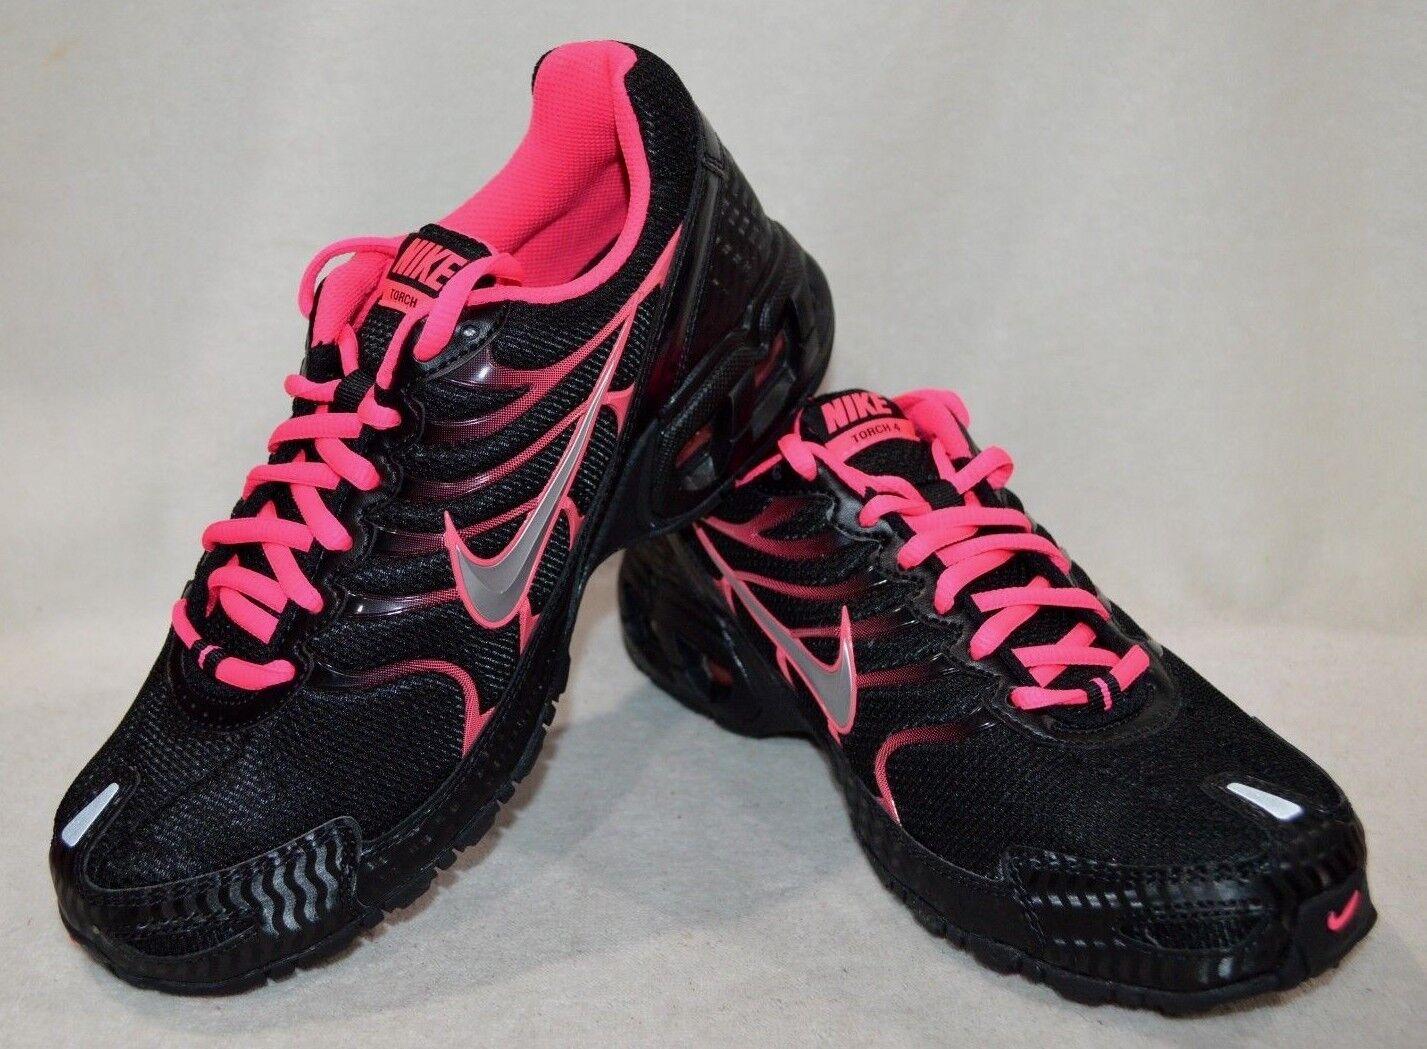 1e4daeee52 Nike Air Max Torch 4 Womens 343851-006 Black Pink Flash Running ...